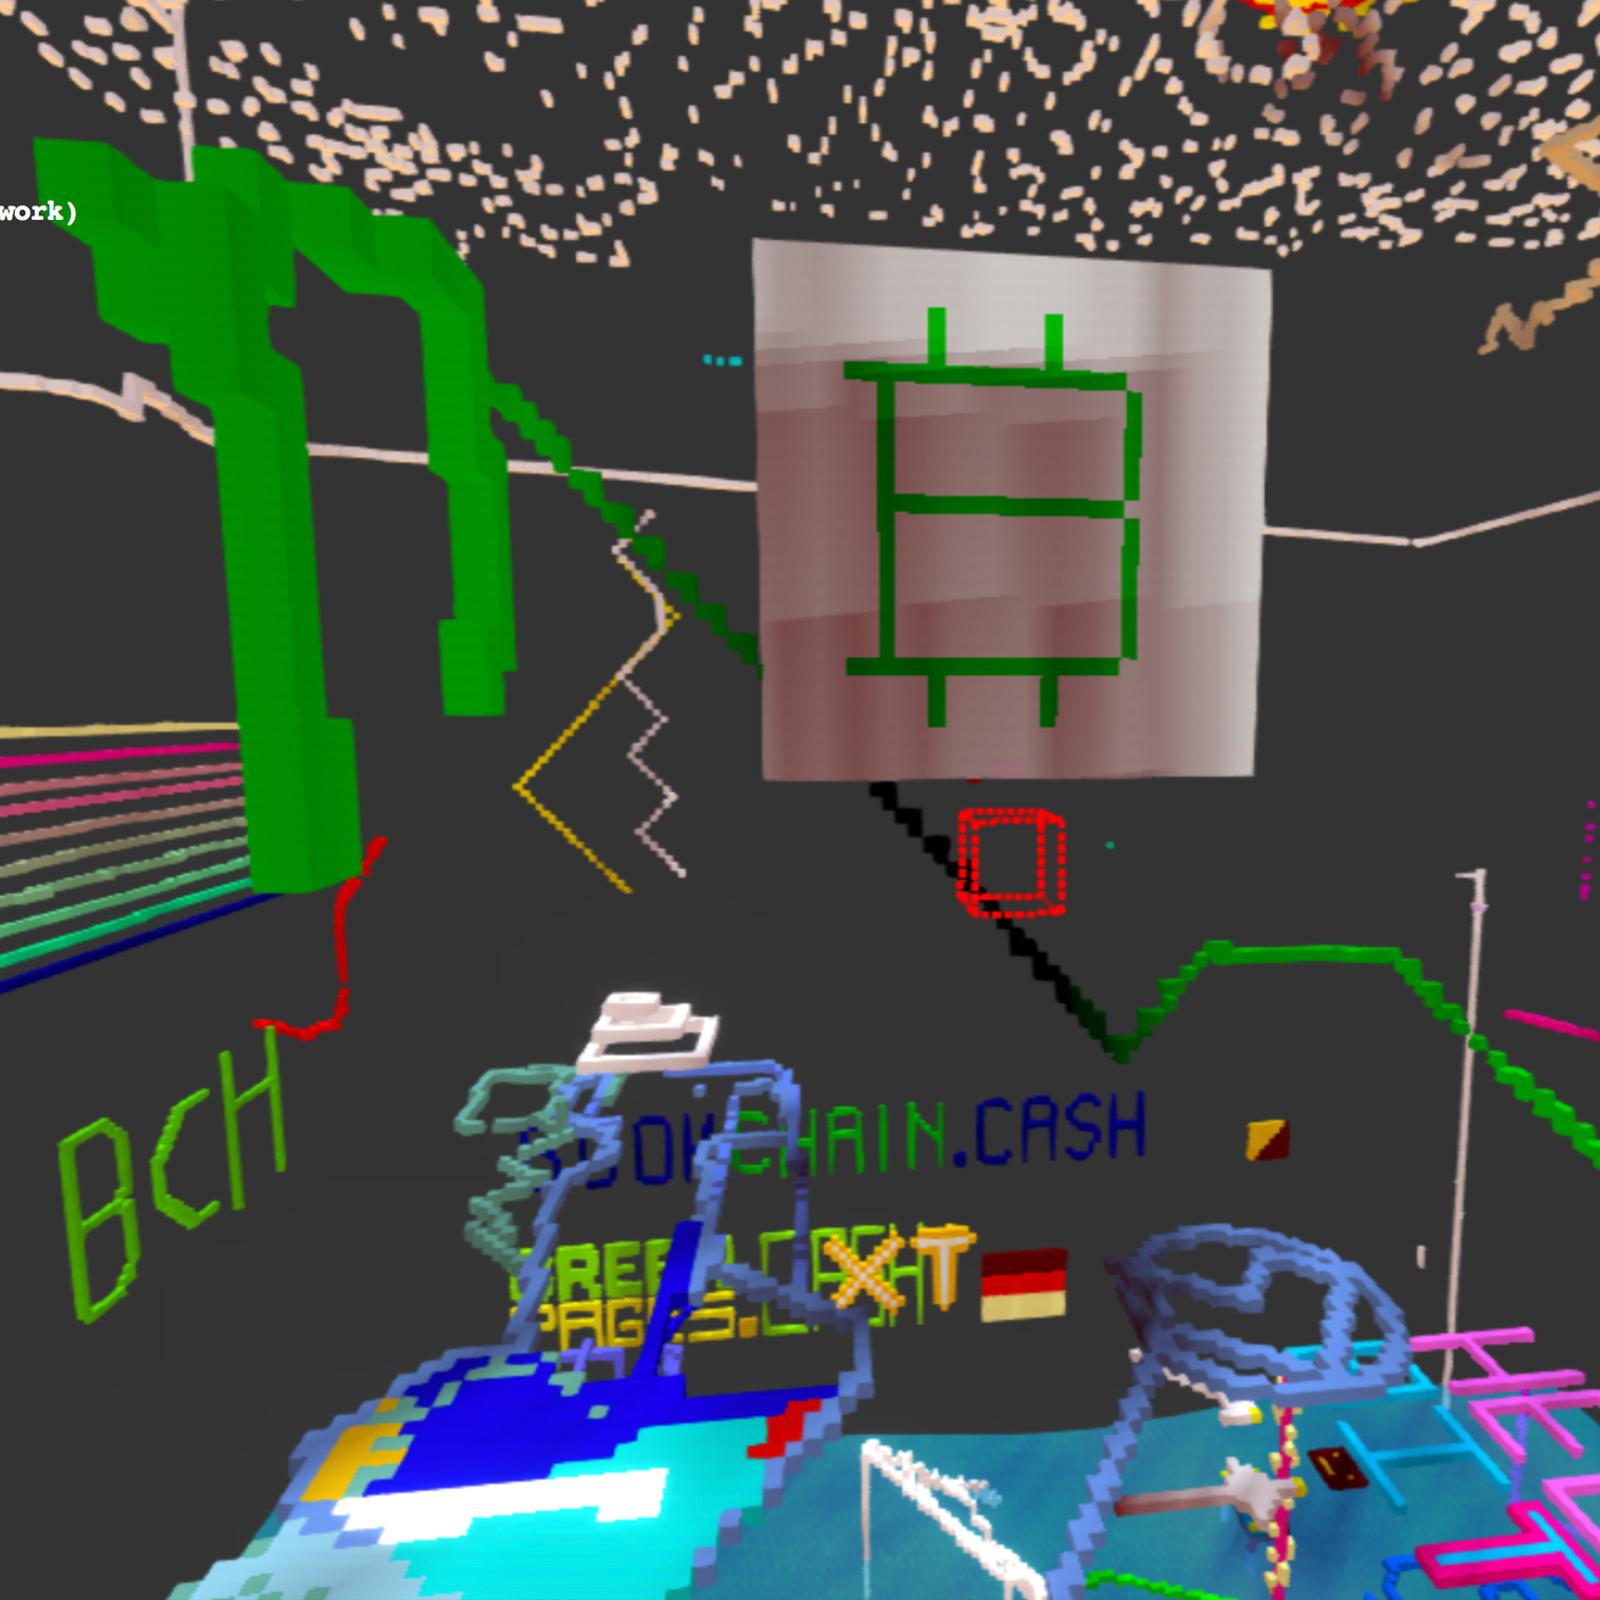 Minecraft-Like Platform Craft.cash Brings a 3D World to Bitcoin Cash